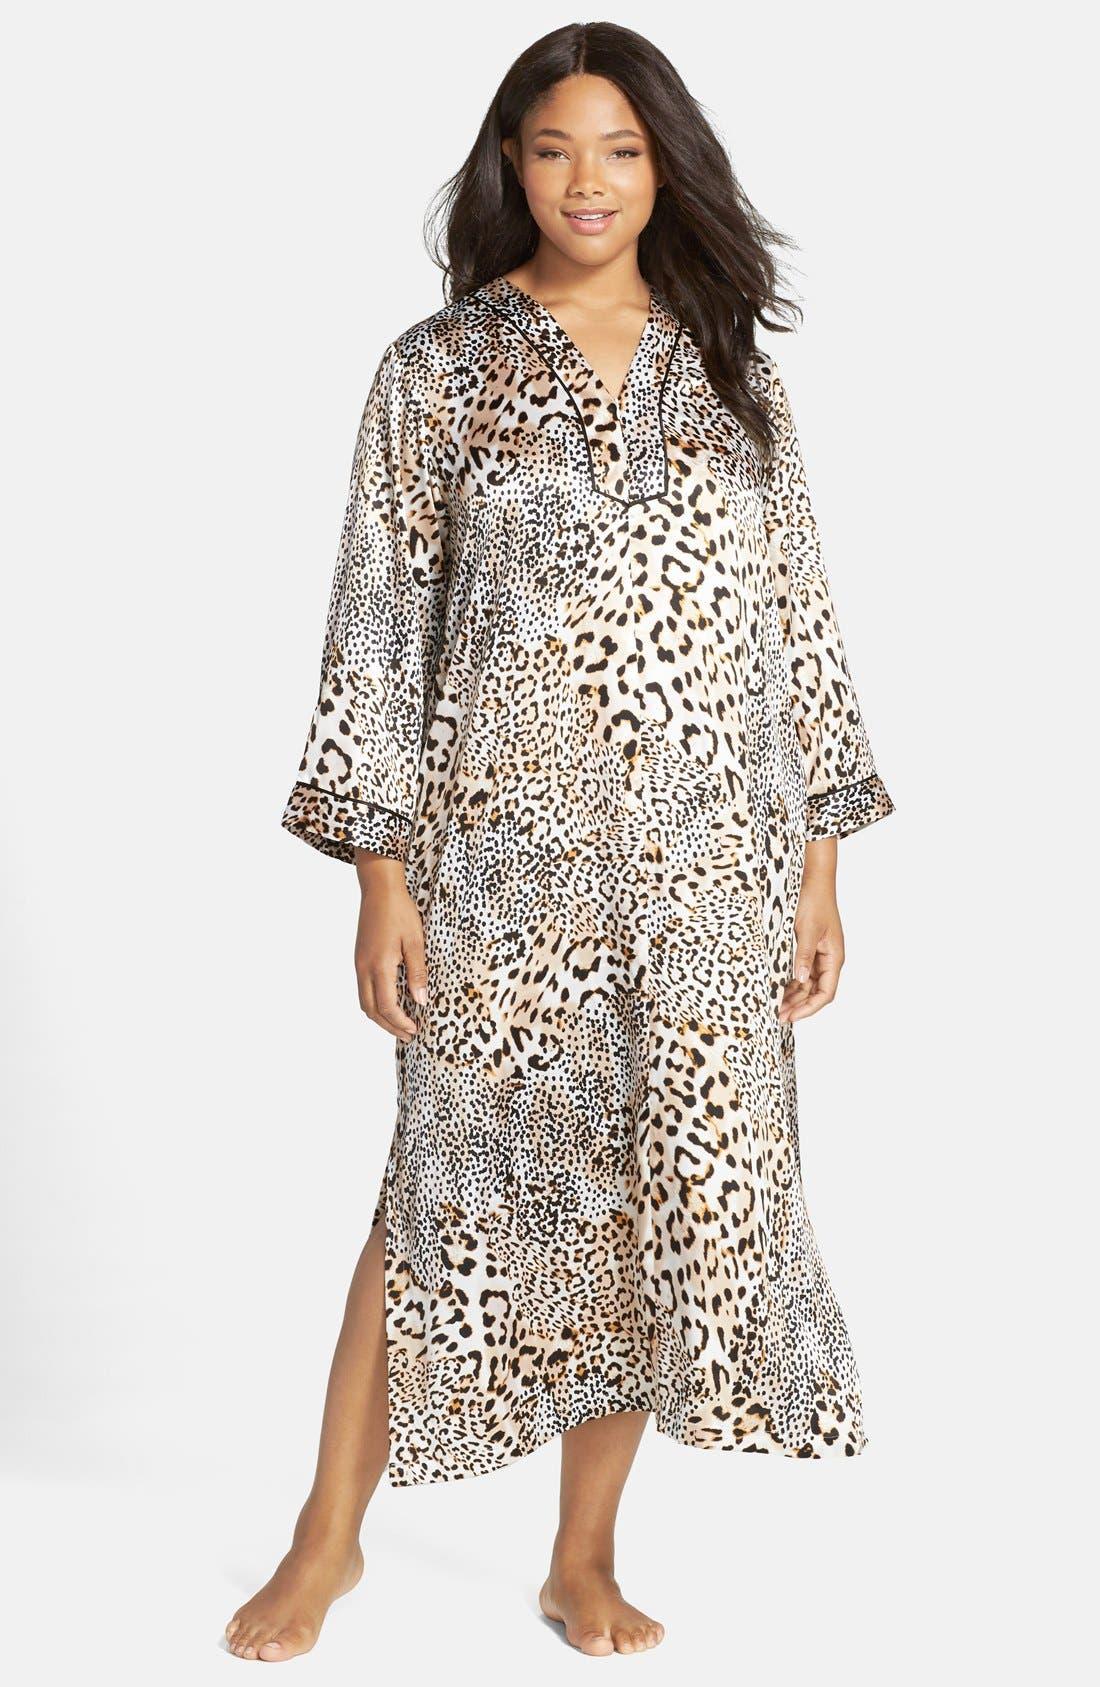 OSCAR DE LA RENTA, Sleepwear Cheetah Print Caftan, Main thumbnail 1, color, 250